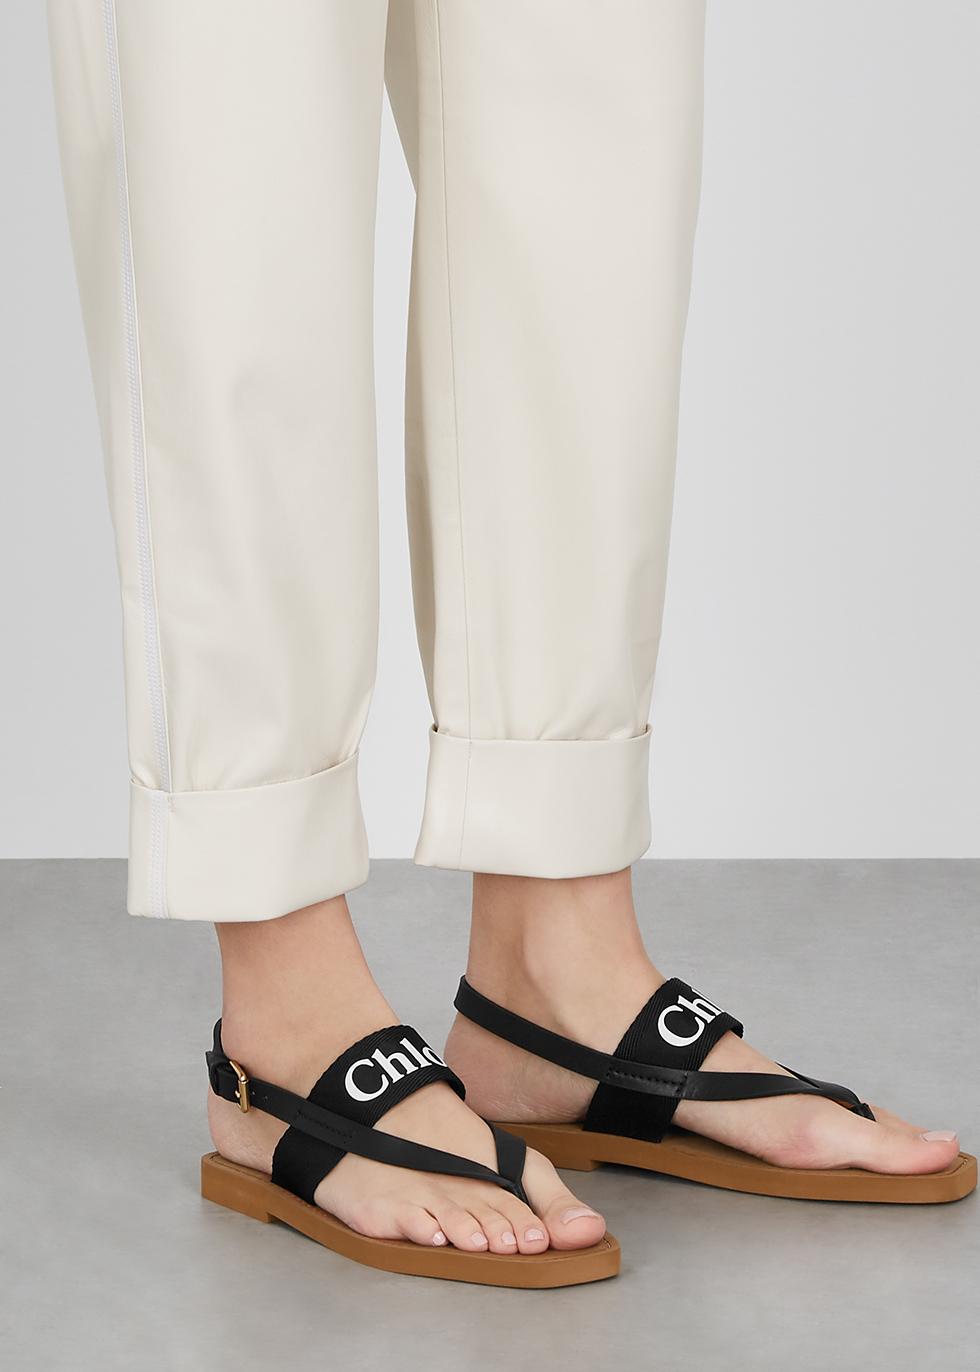 Chloé Black logo leather sandals